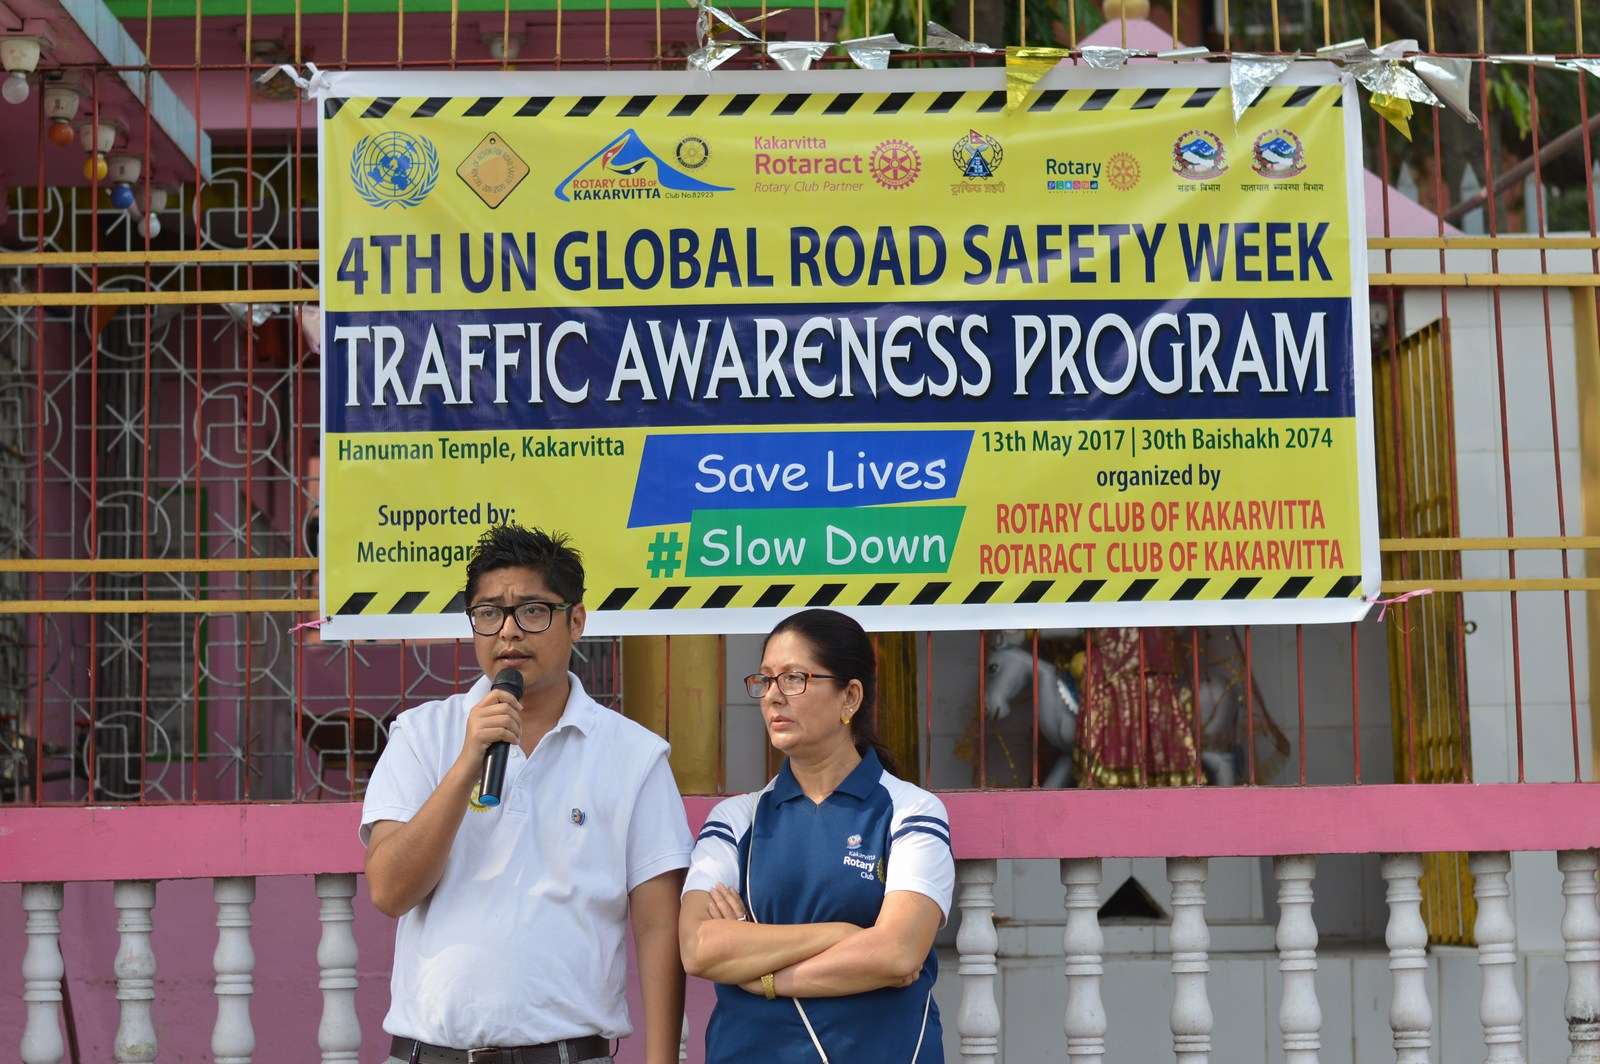 4th-UN-Global-Road-Safety-Week-2017-Traffic-Awareness-Program-Rotary-club-of-Kakarvitta-9